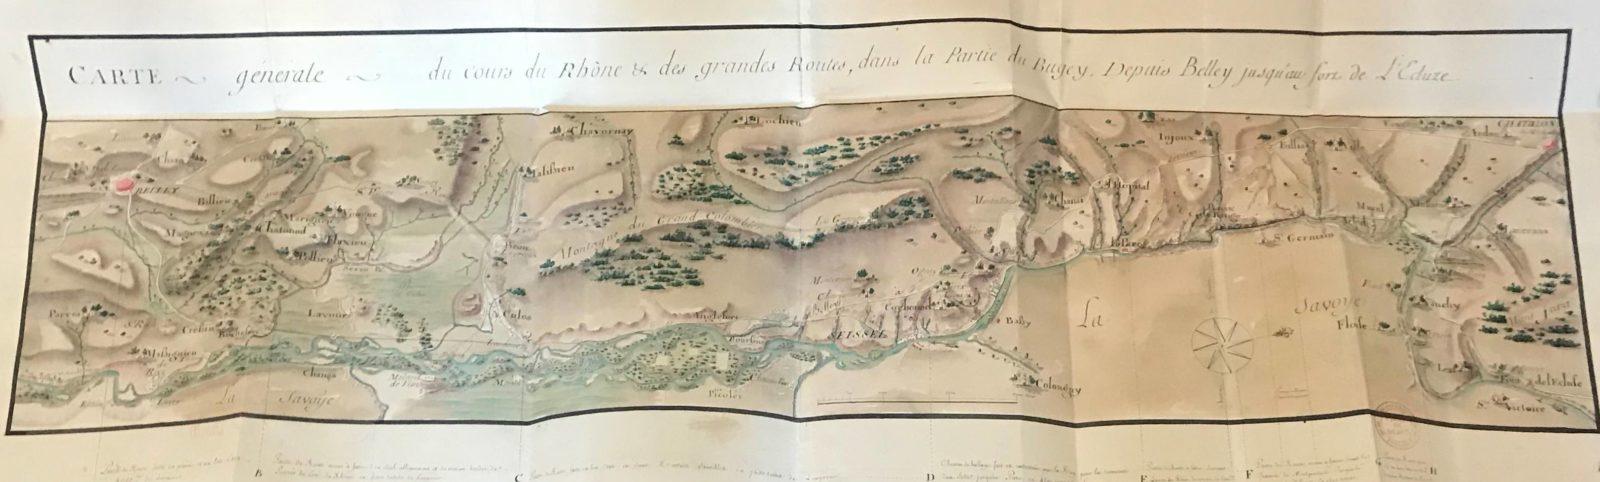 Archives municipales de Dijon Léonard Racle carte Bugey